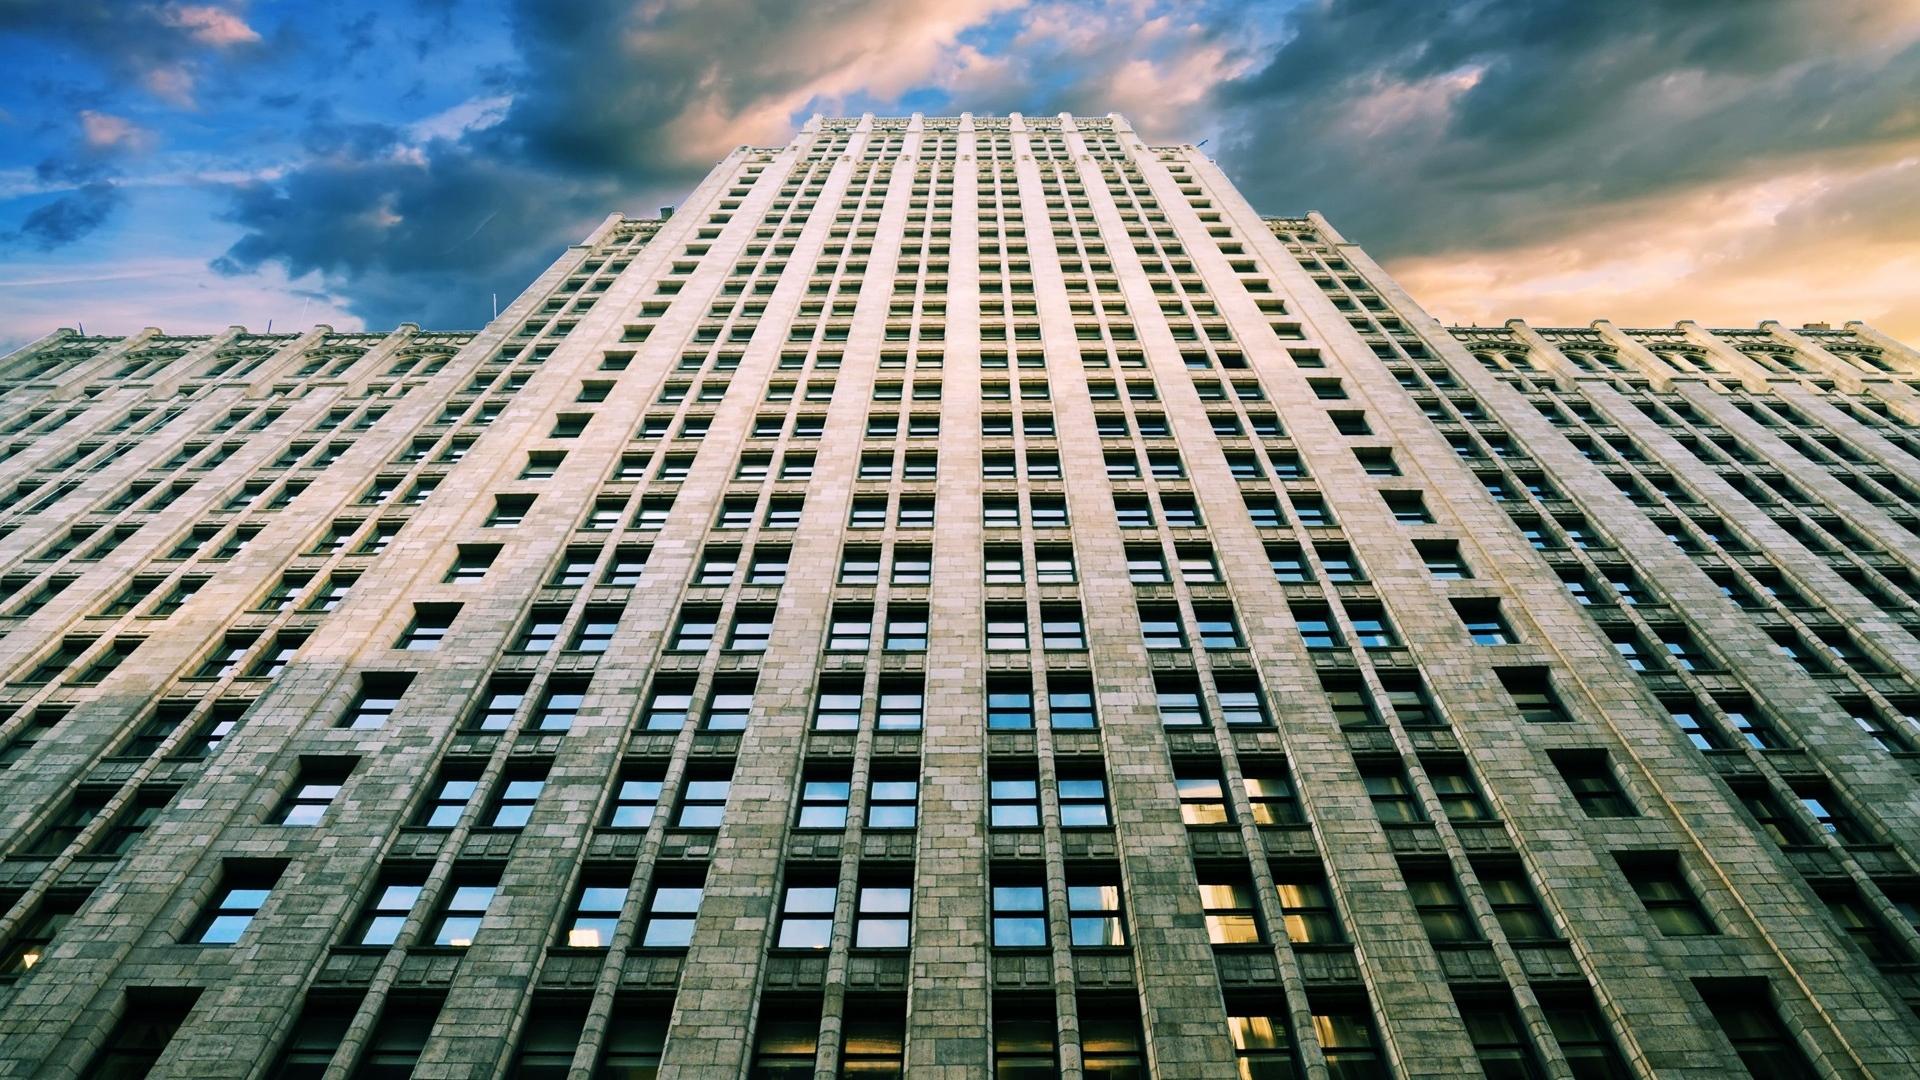 Building-Skyscraper-High-Rise-Wallpaper